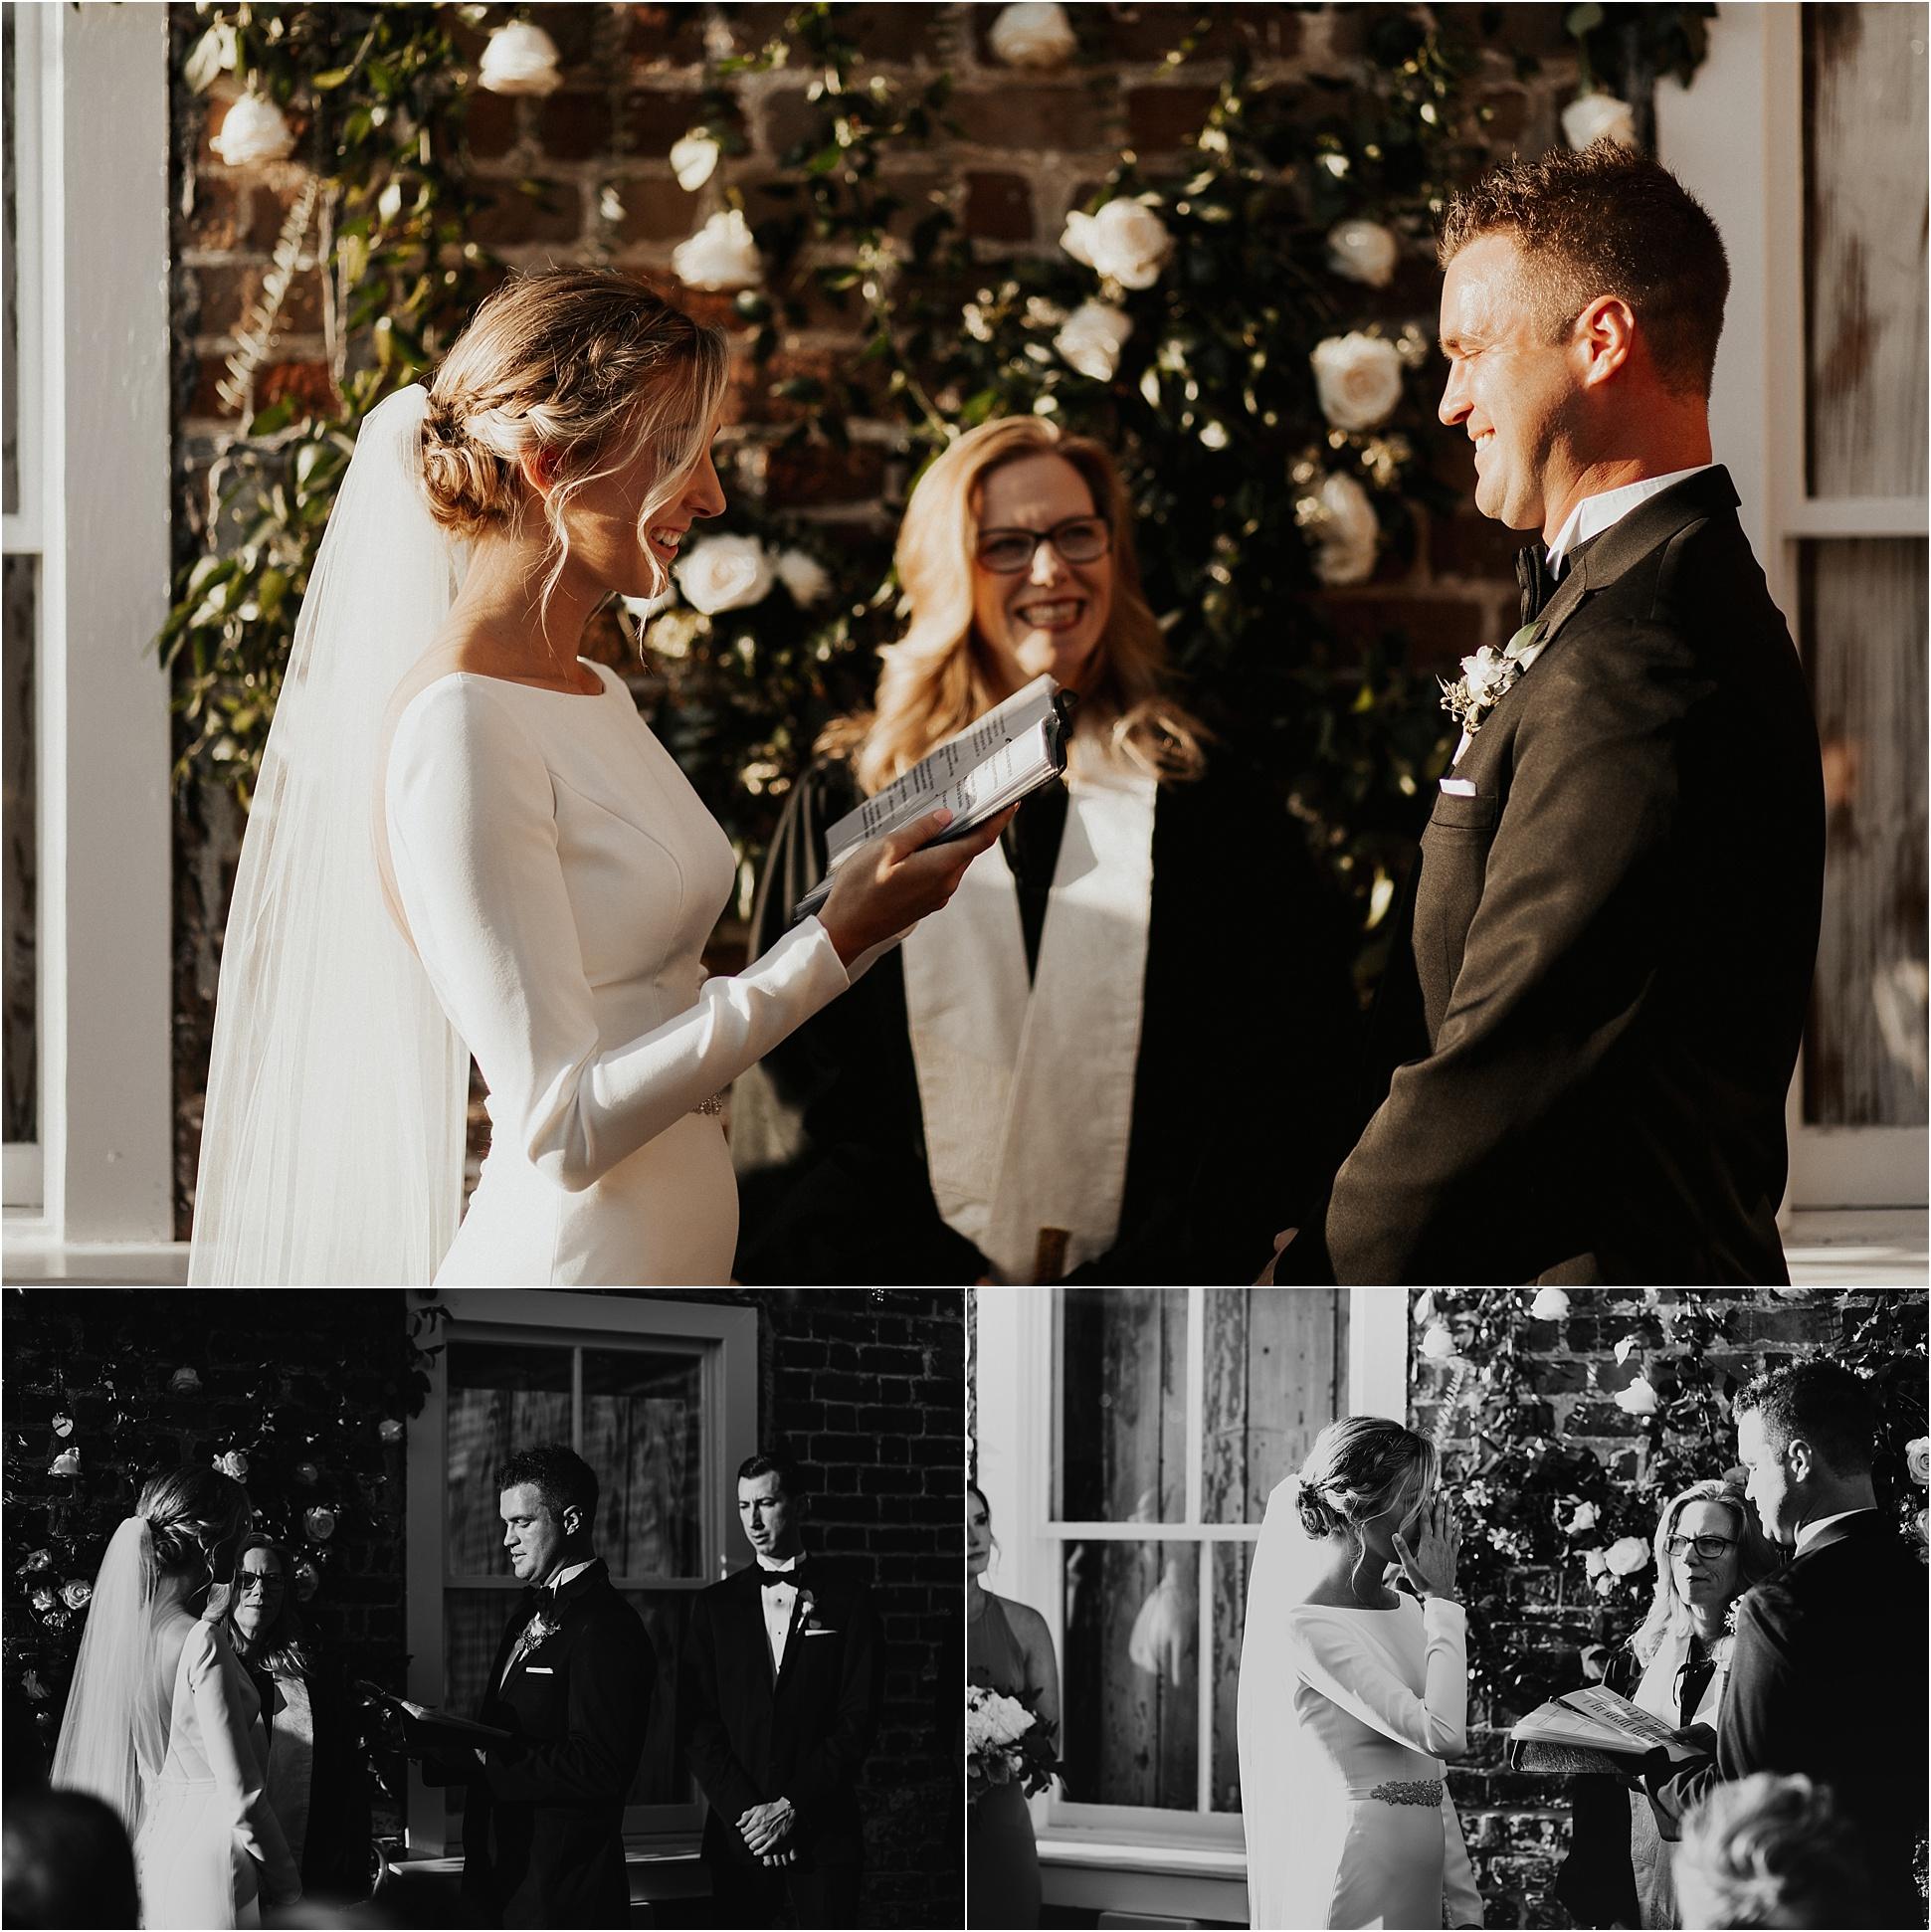 upstairs_midtown_intimate_charleston_wedding045.JPG